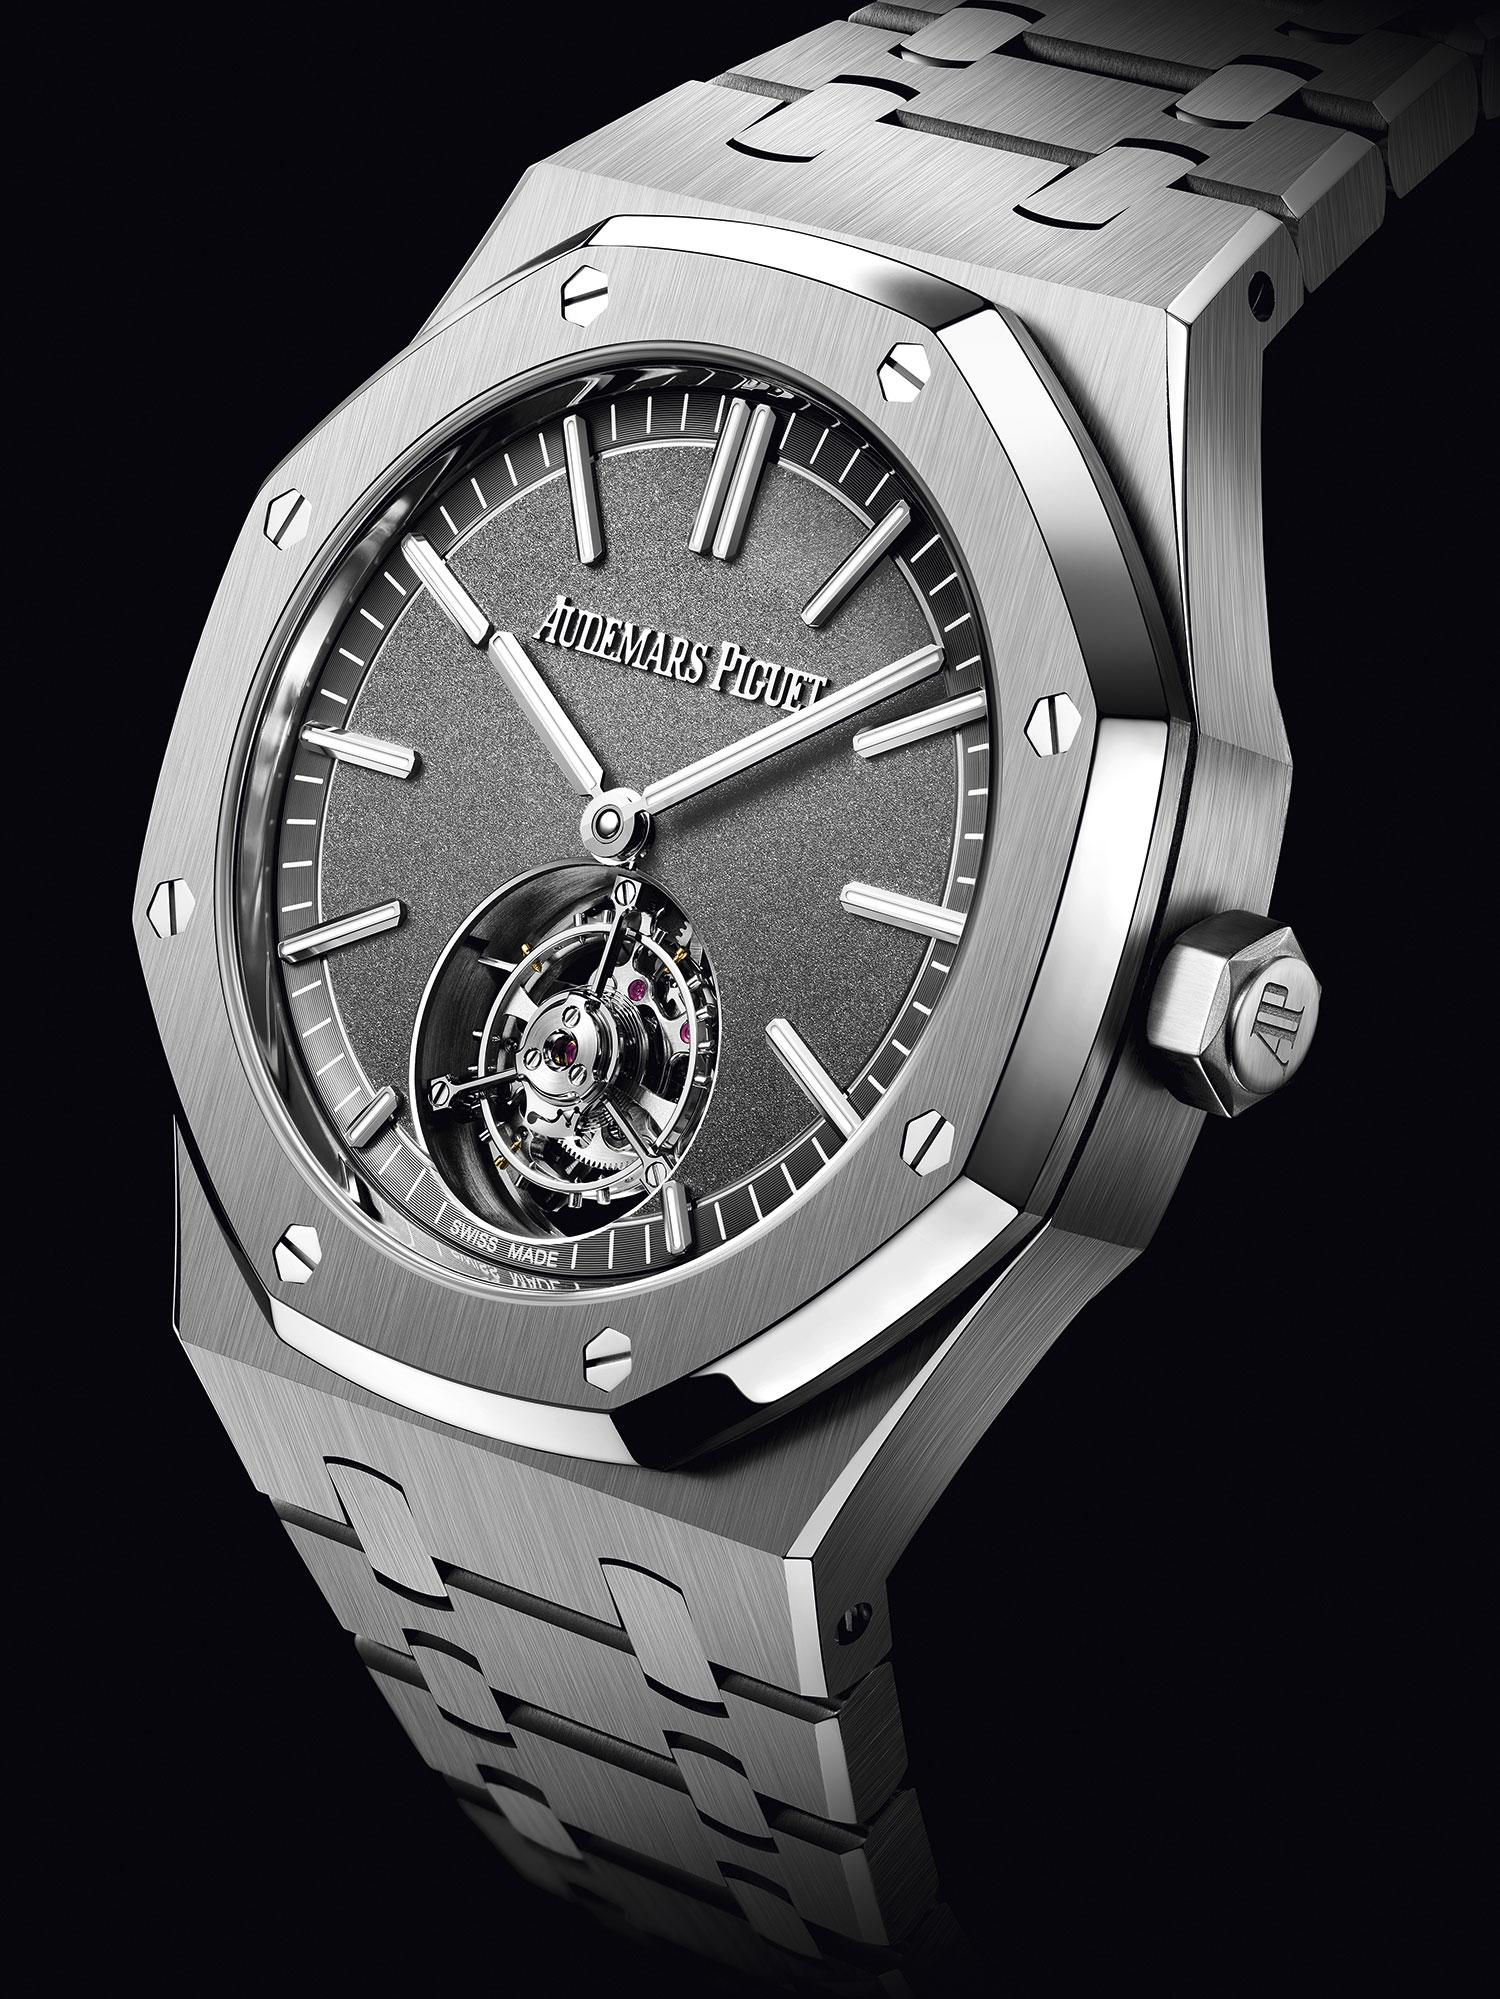 Audemars-Piguet-Royal-Oak-Selfwinding-Flying-Tourbillon-titanio-perfil-Horas-y-Minutos.jpg